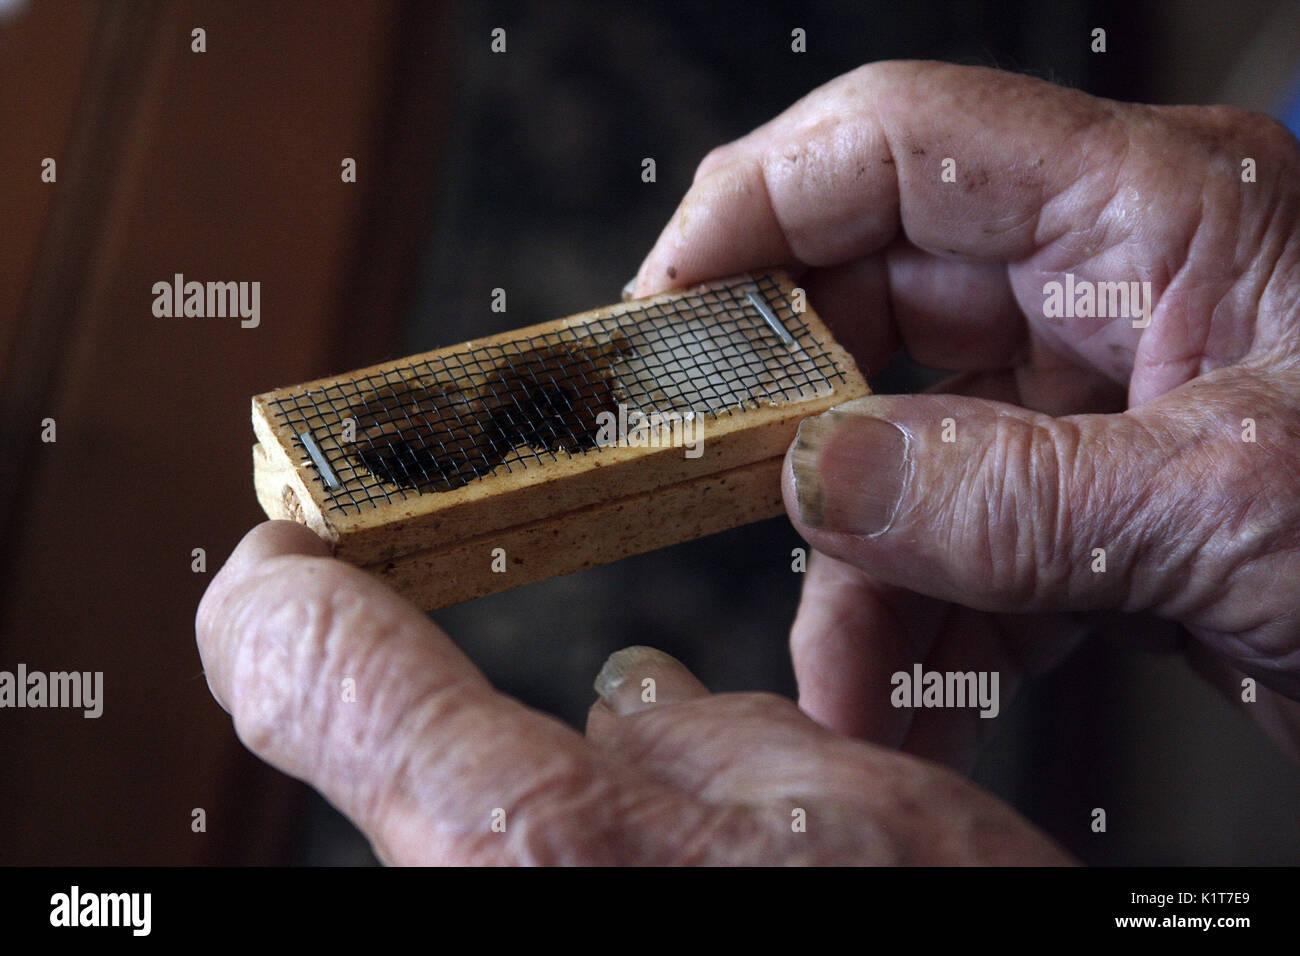 Close up of old man's hands, with rheumatoid arthritis - Stock Image